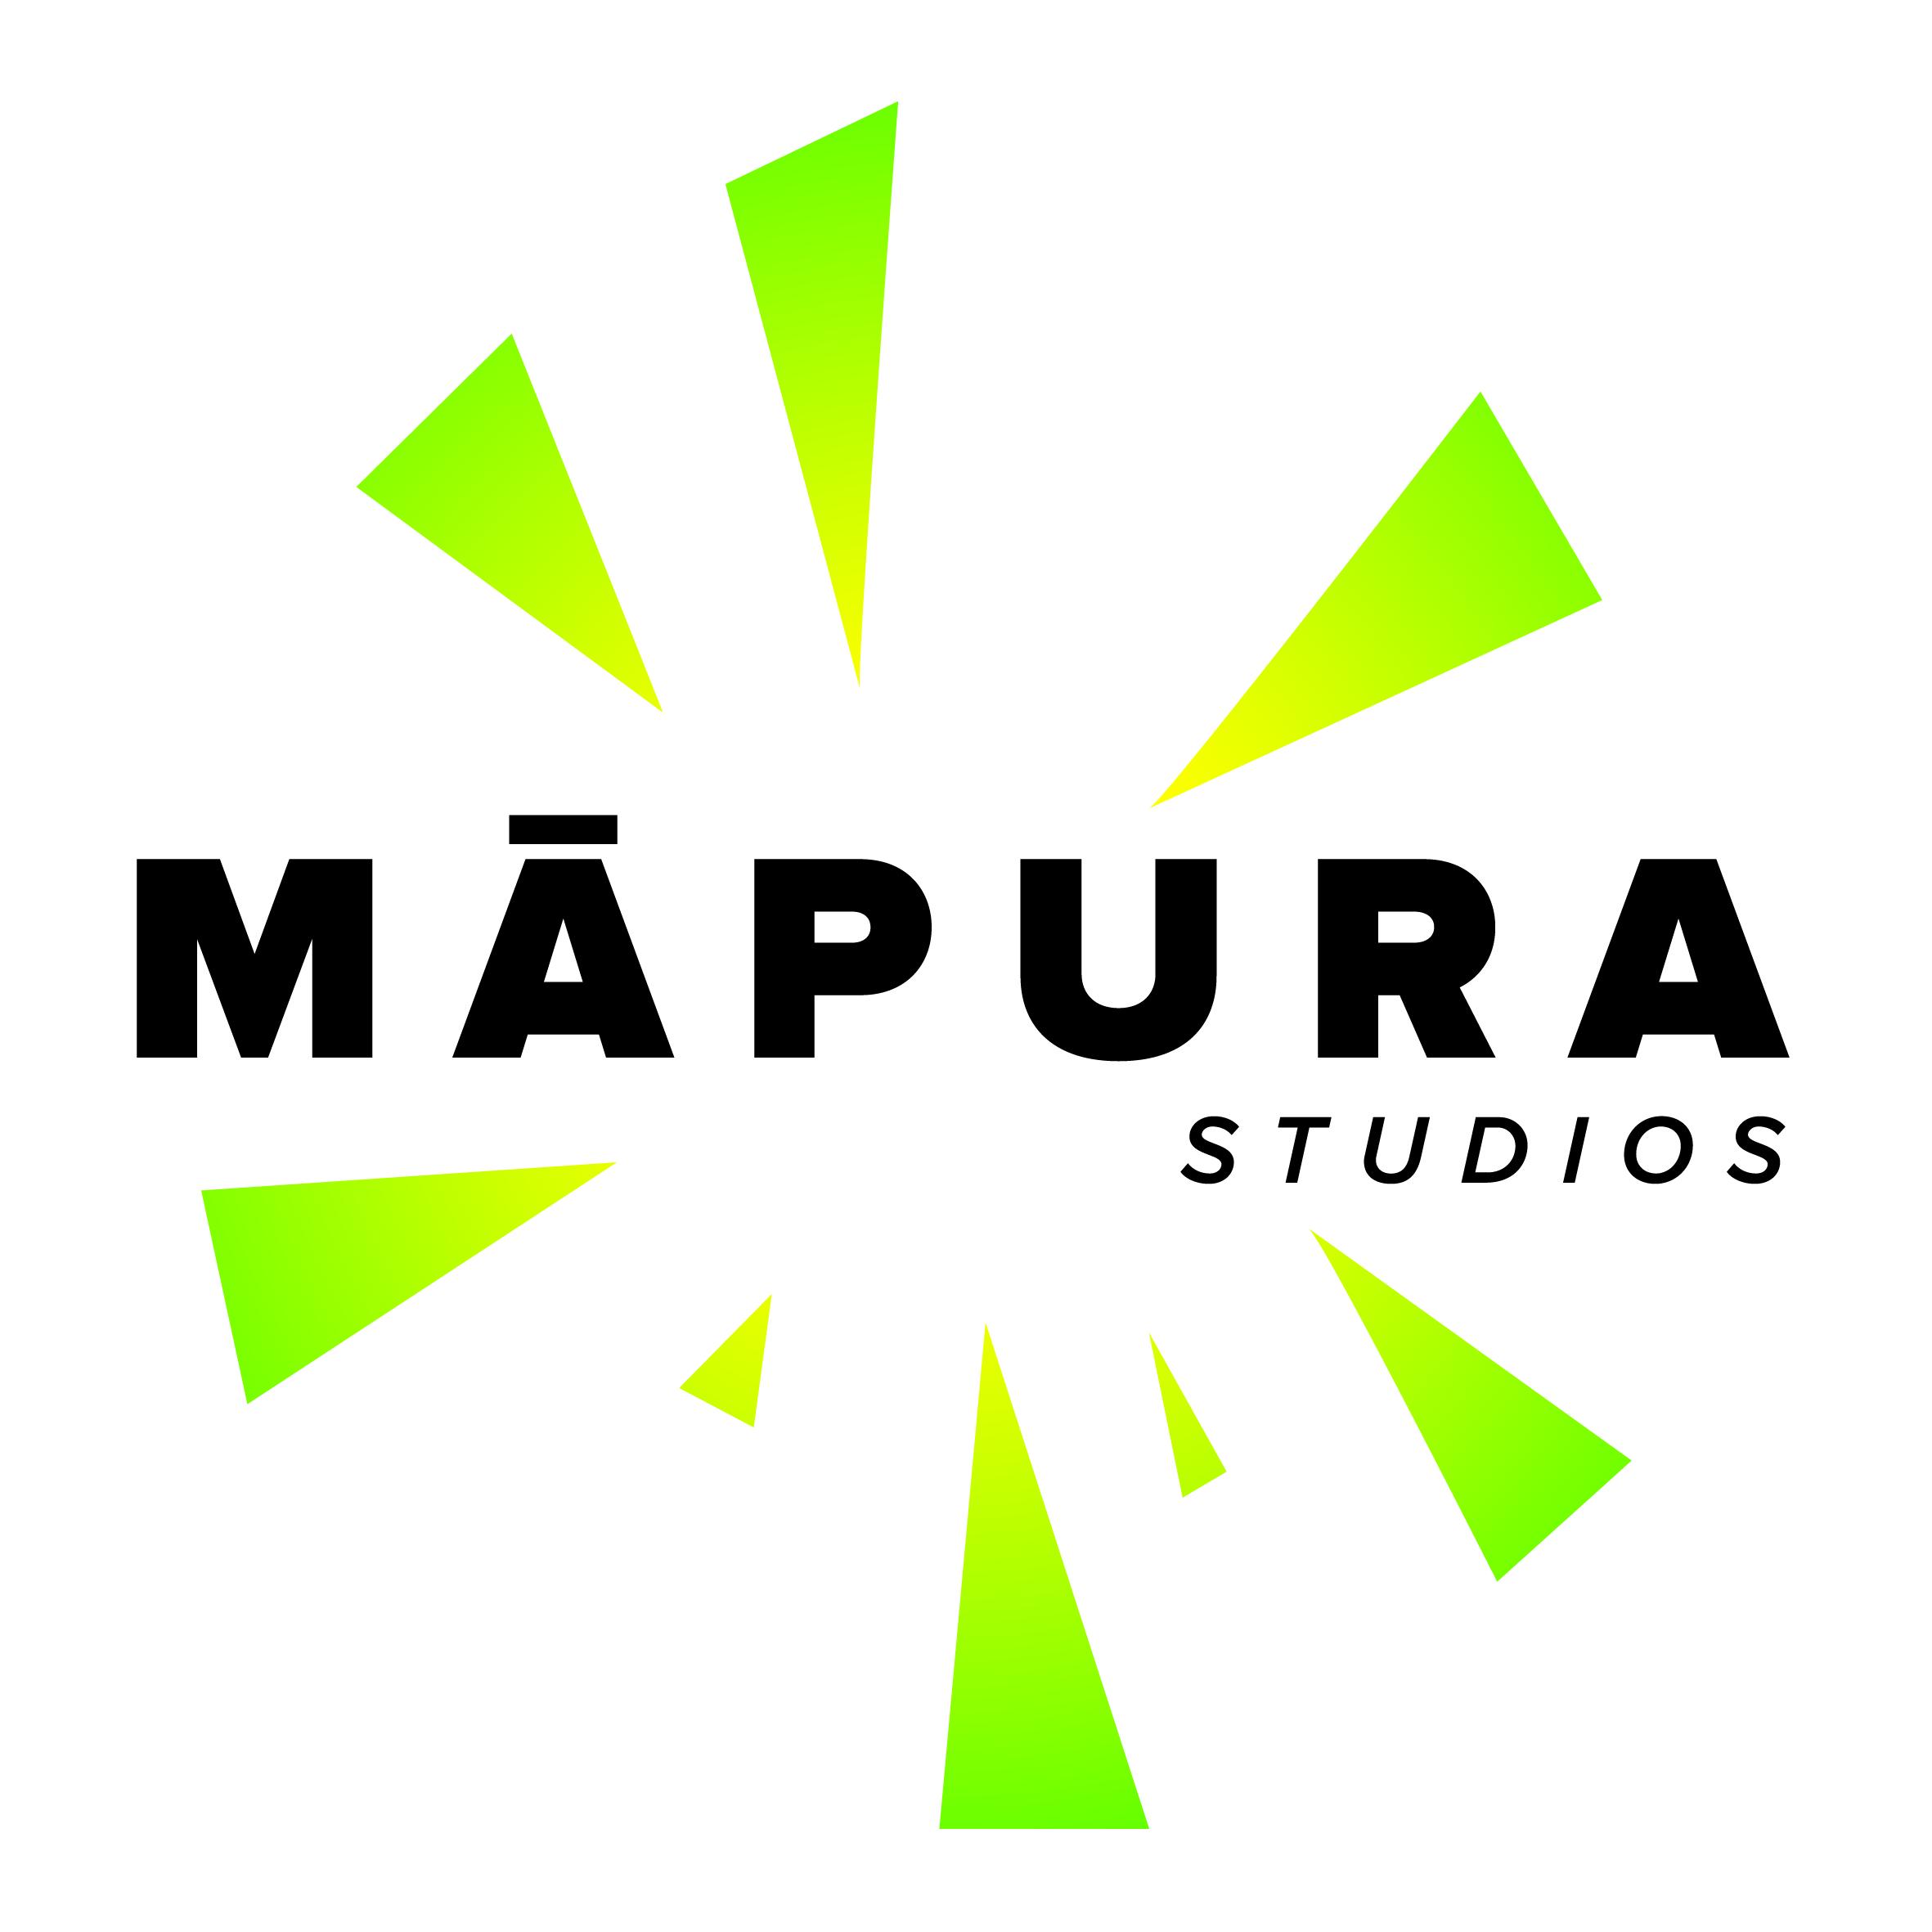 Mapura Studios